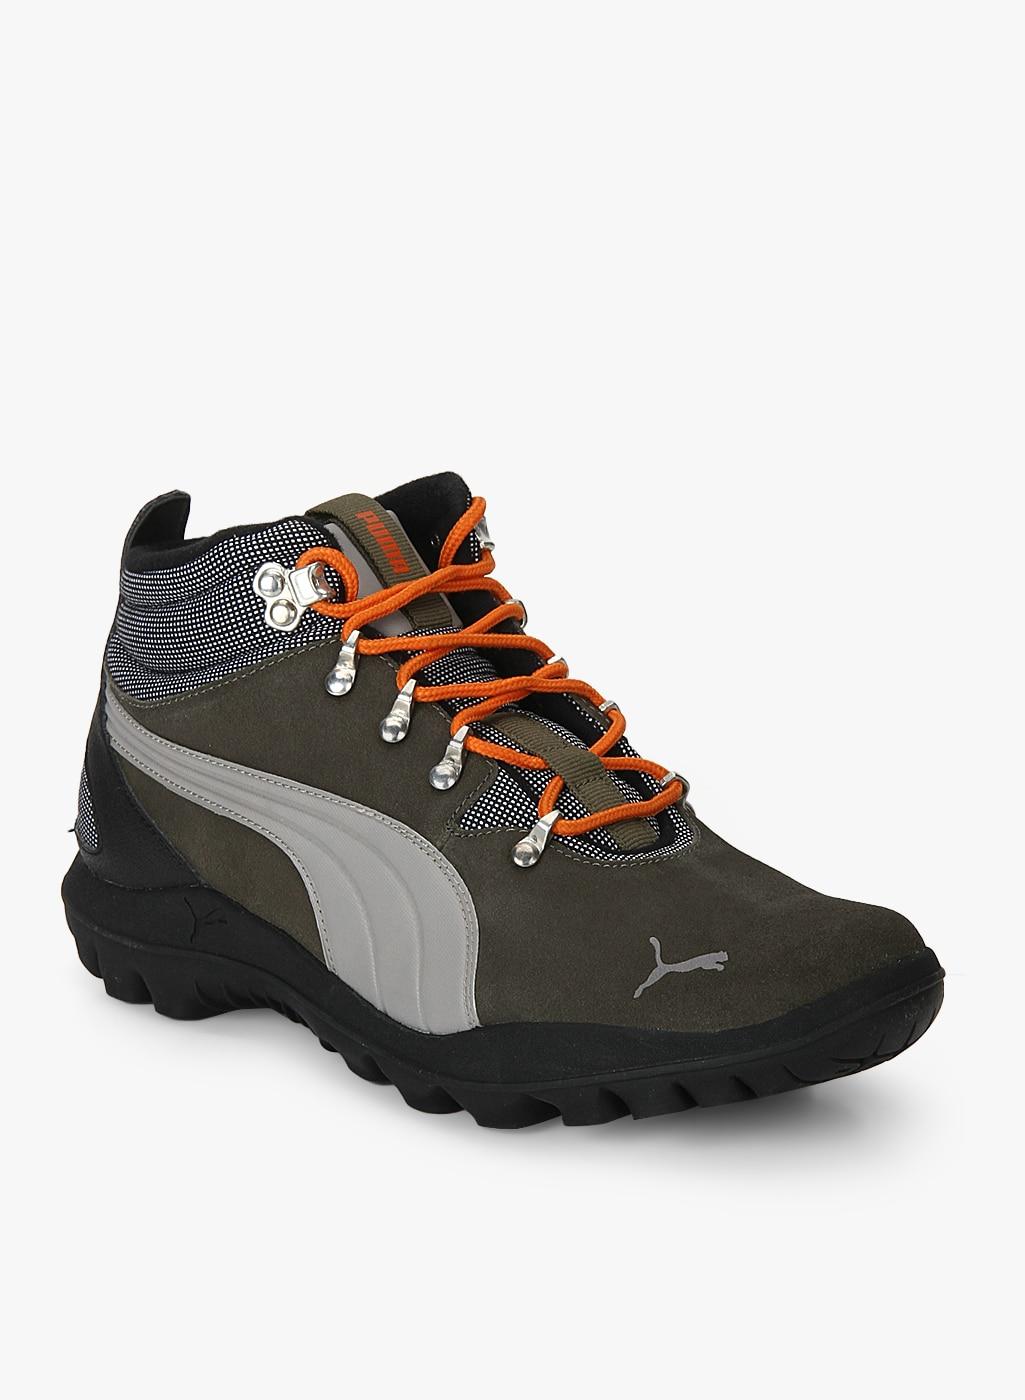 cc3d2582f7ff Puma Tatau Fur 2 Idp Dark Grey Outdoor Shoes for Men online in India ...